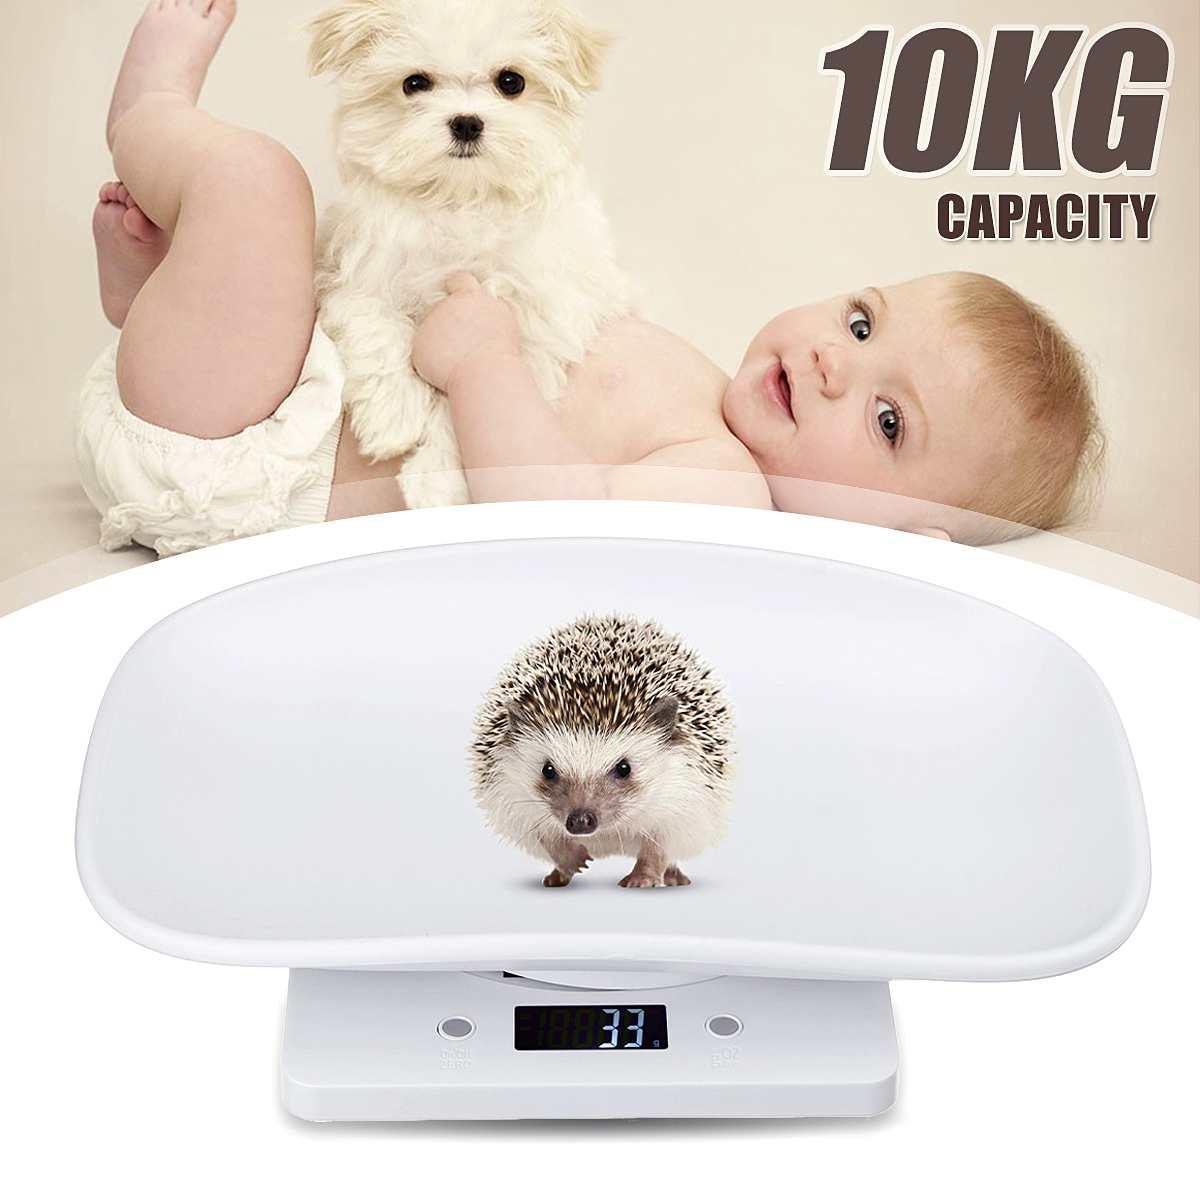 10kg / 1g Multi-function Digital Electronic Small Pet Animals Balance Newborn Baby Scale 18x29x5.8cm